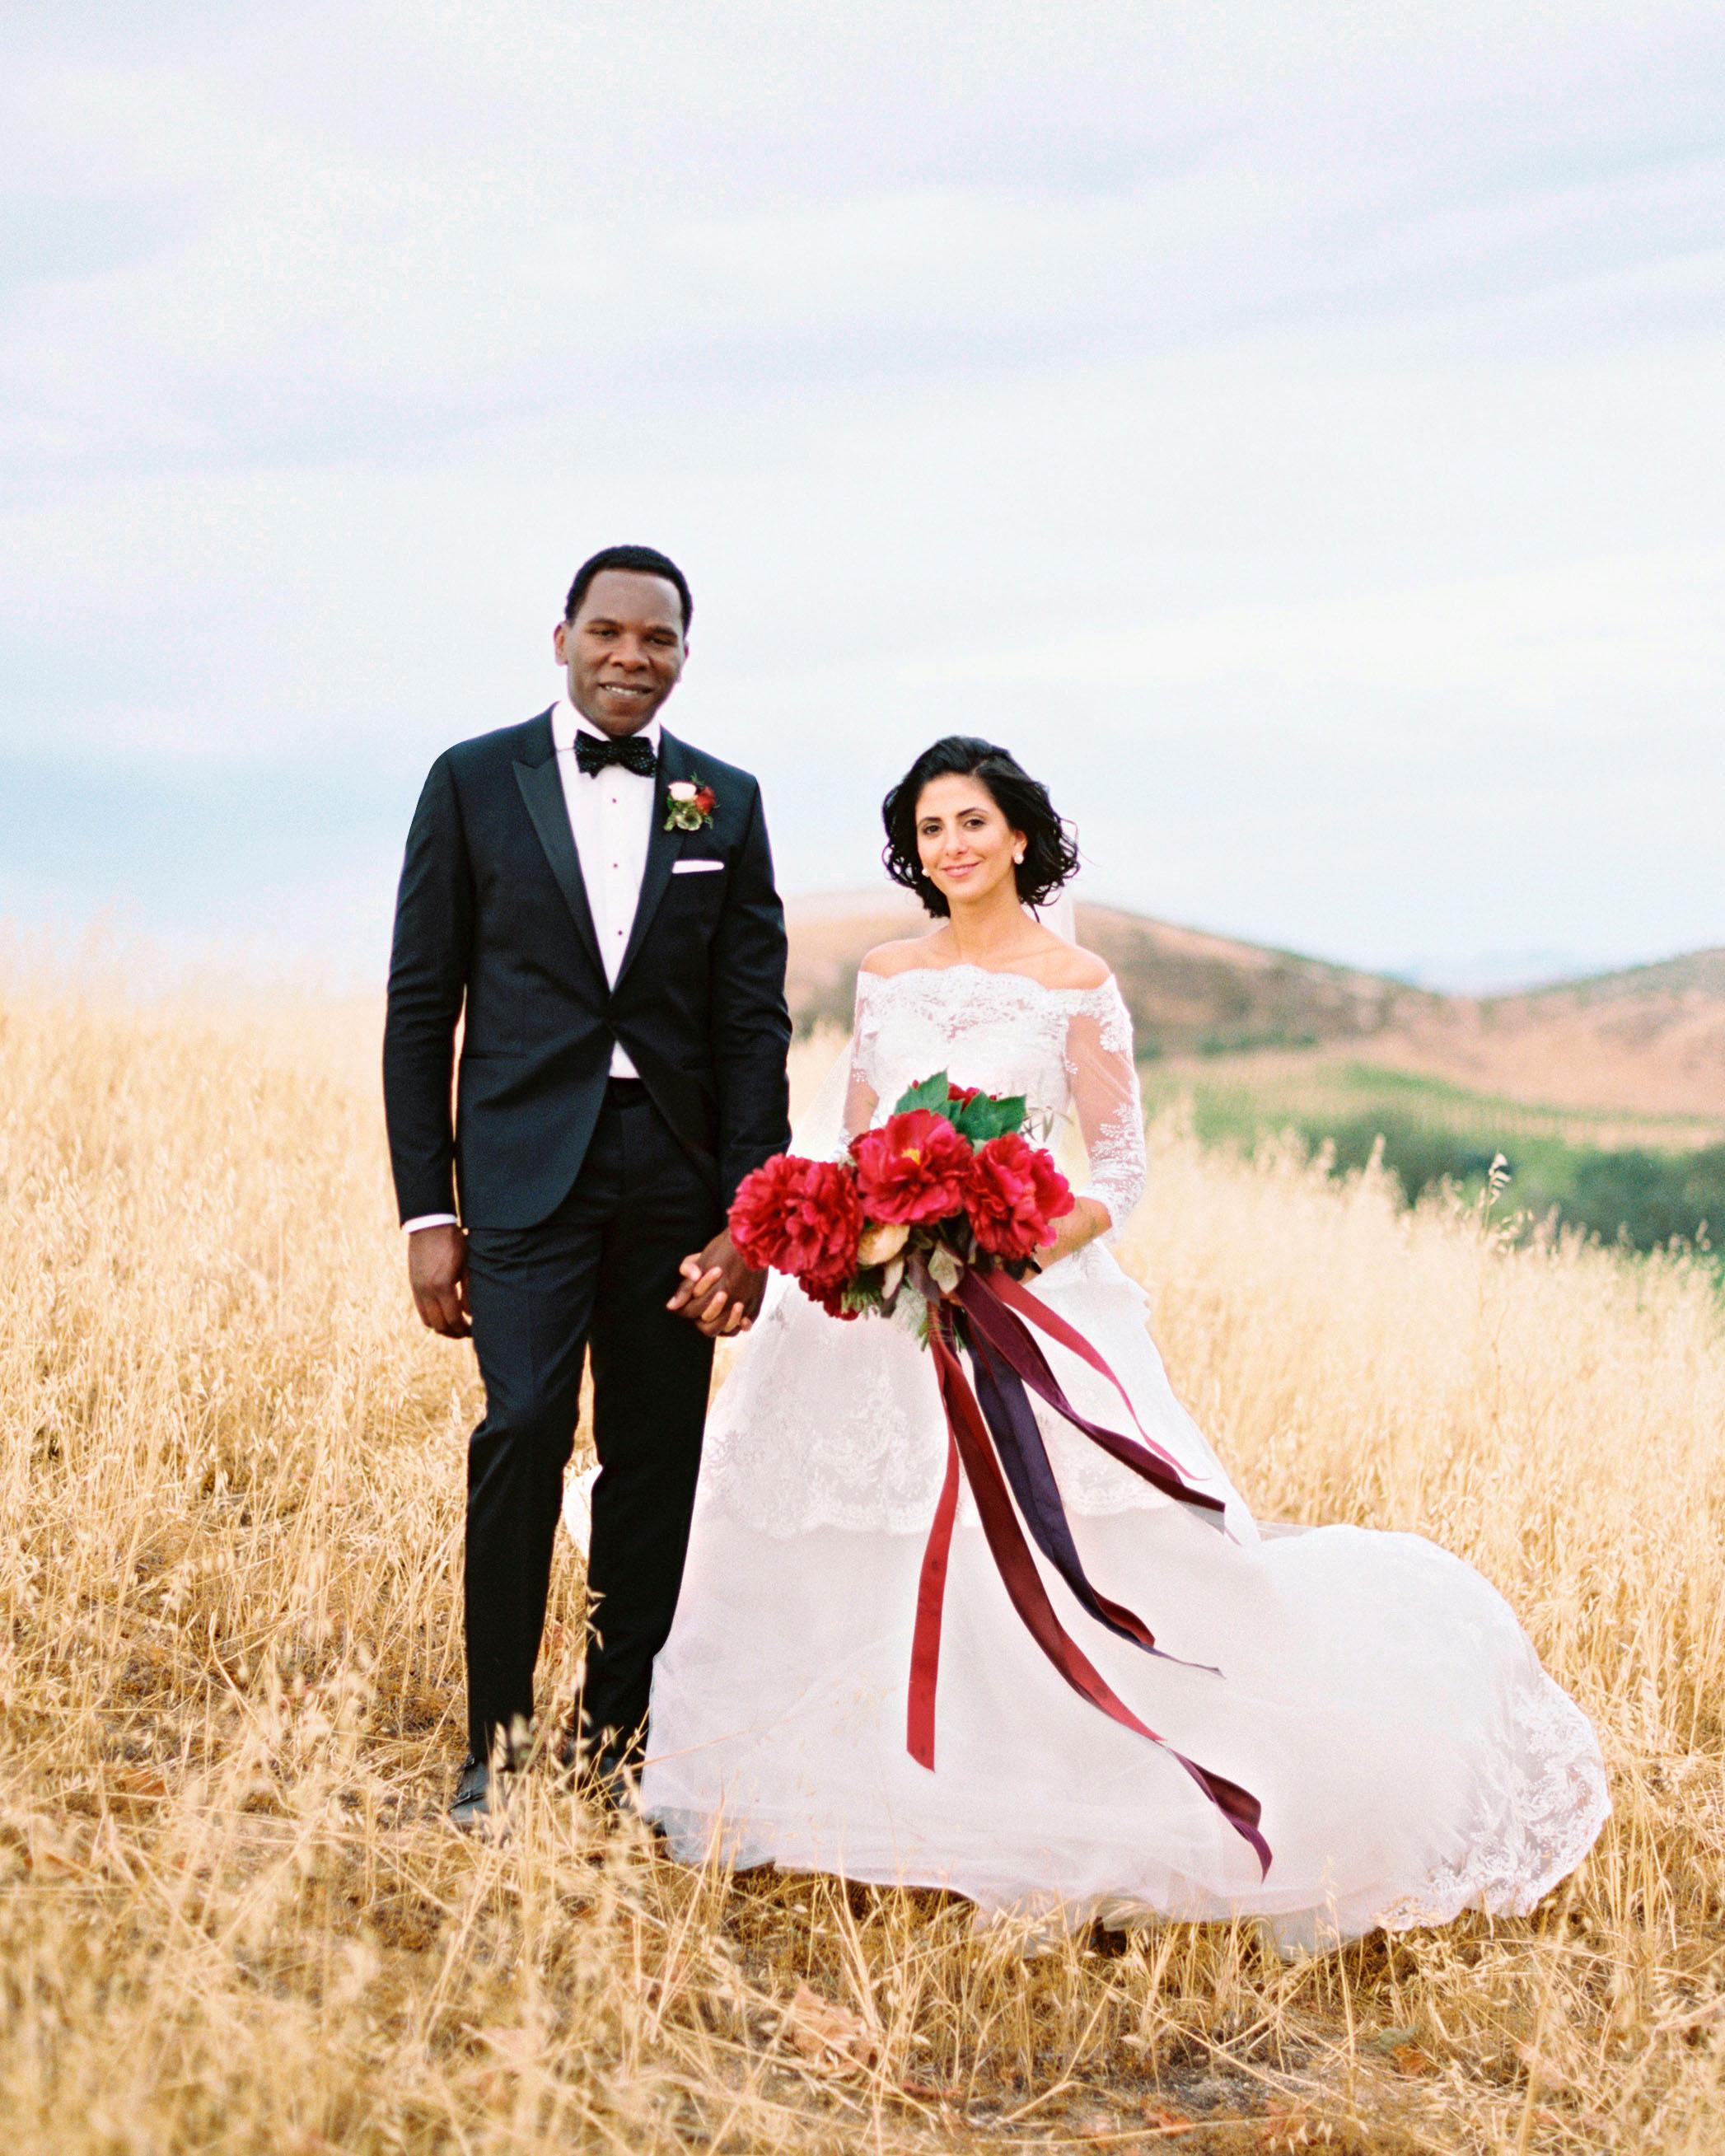 hana olu wedding california portrait